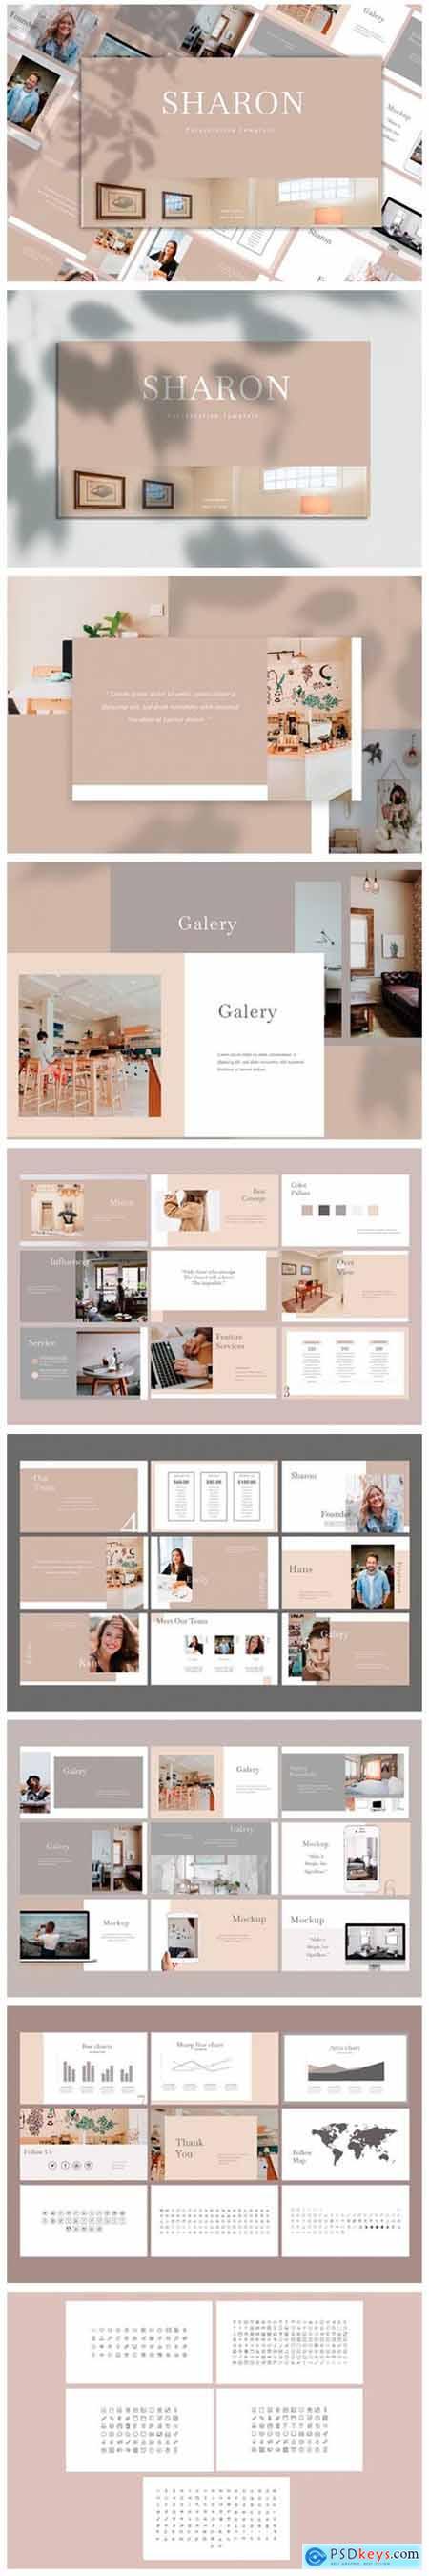 Sharon - PowerPoint Template 2276600